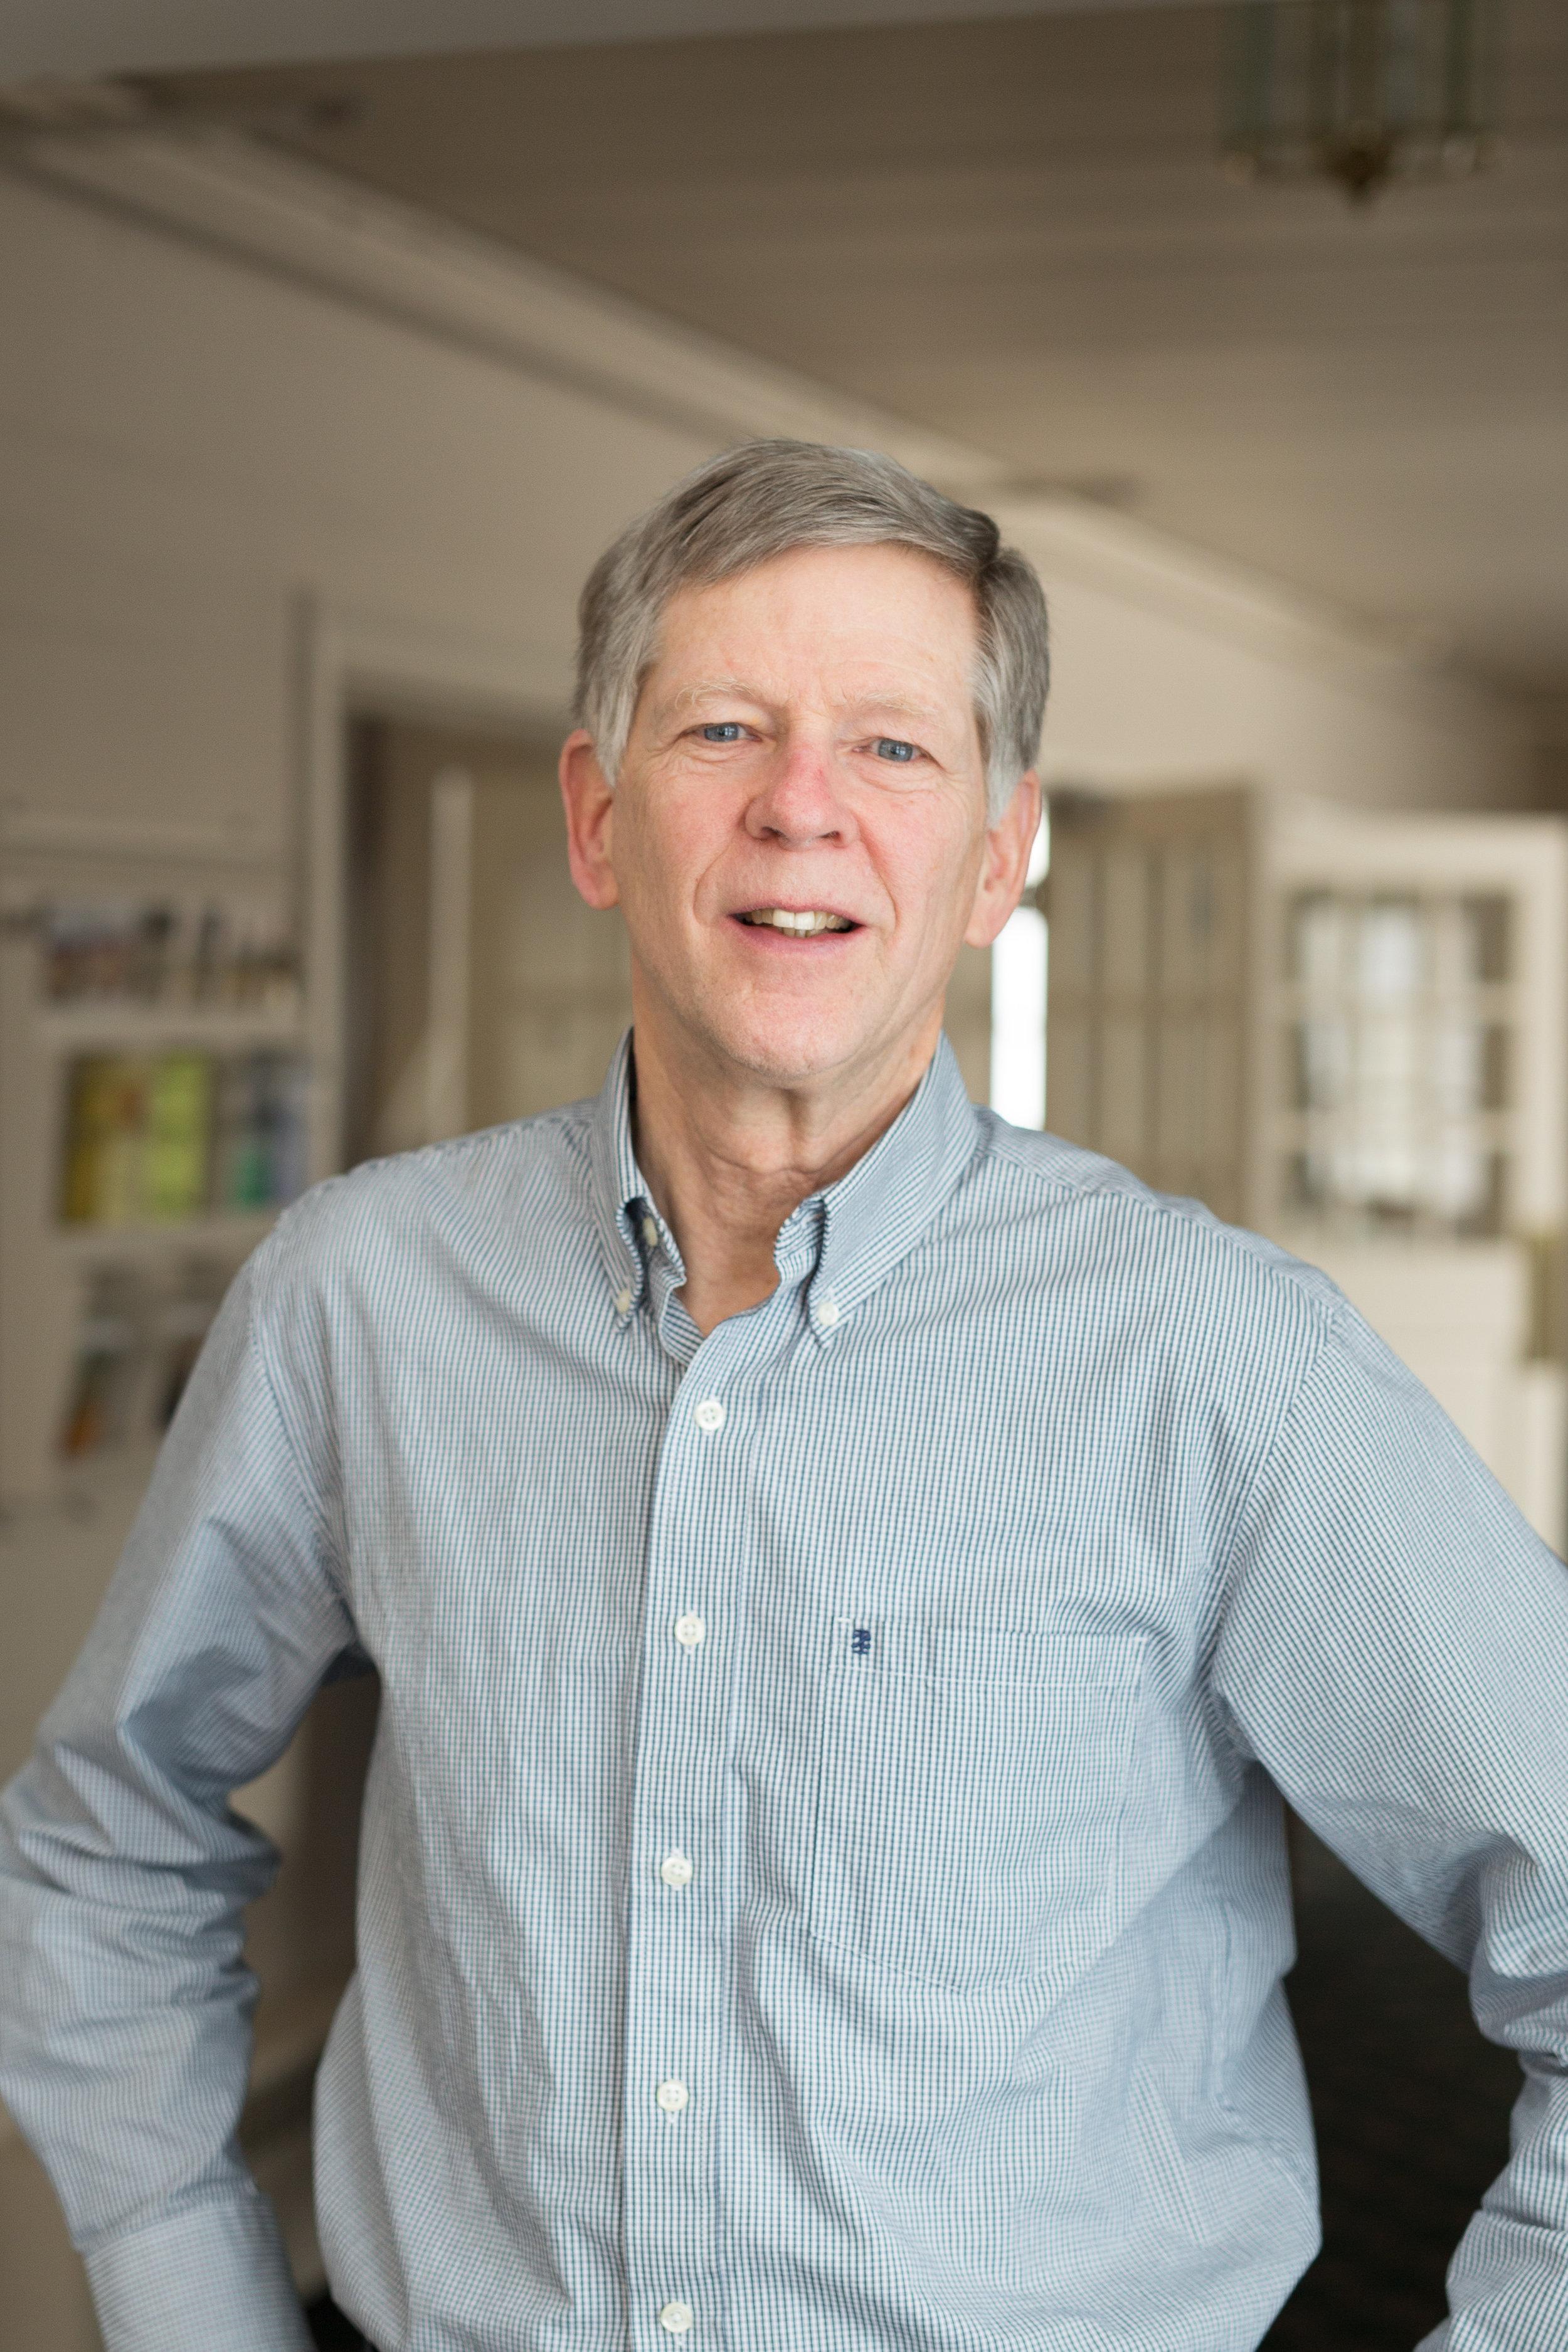 Dave Van Randwyk